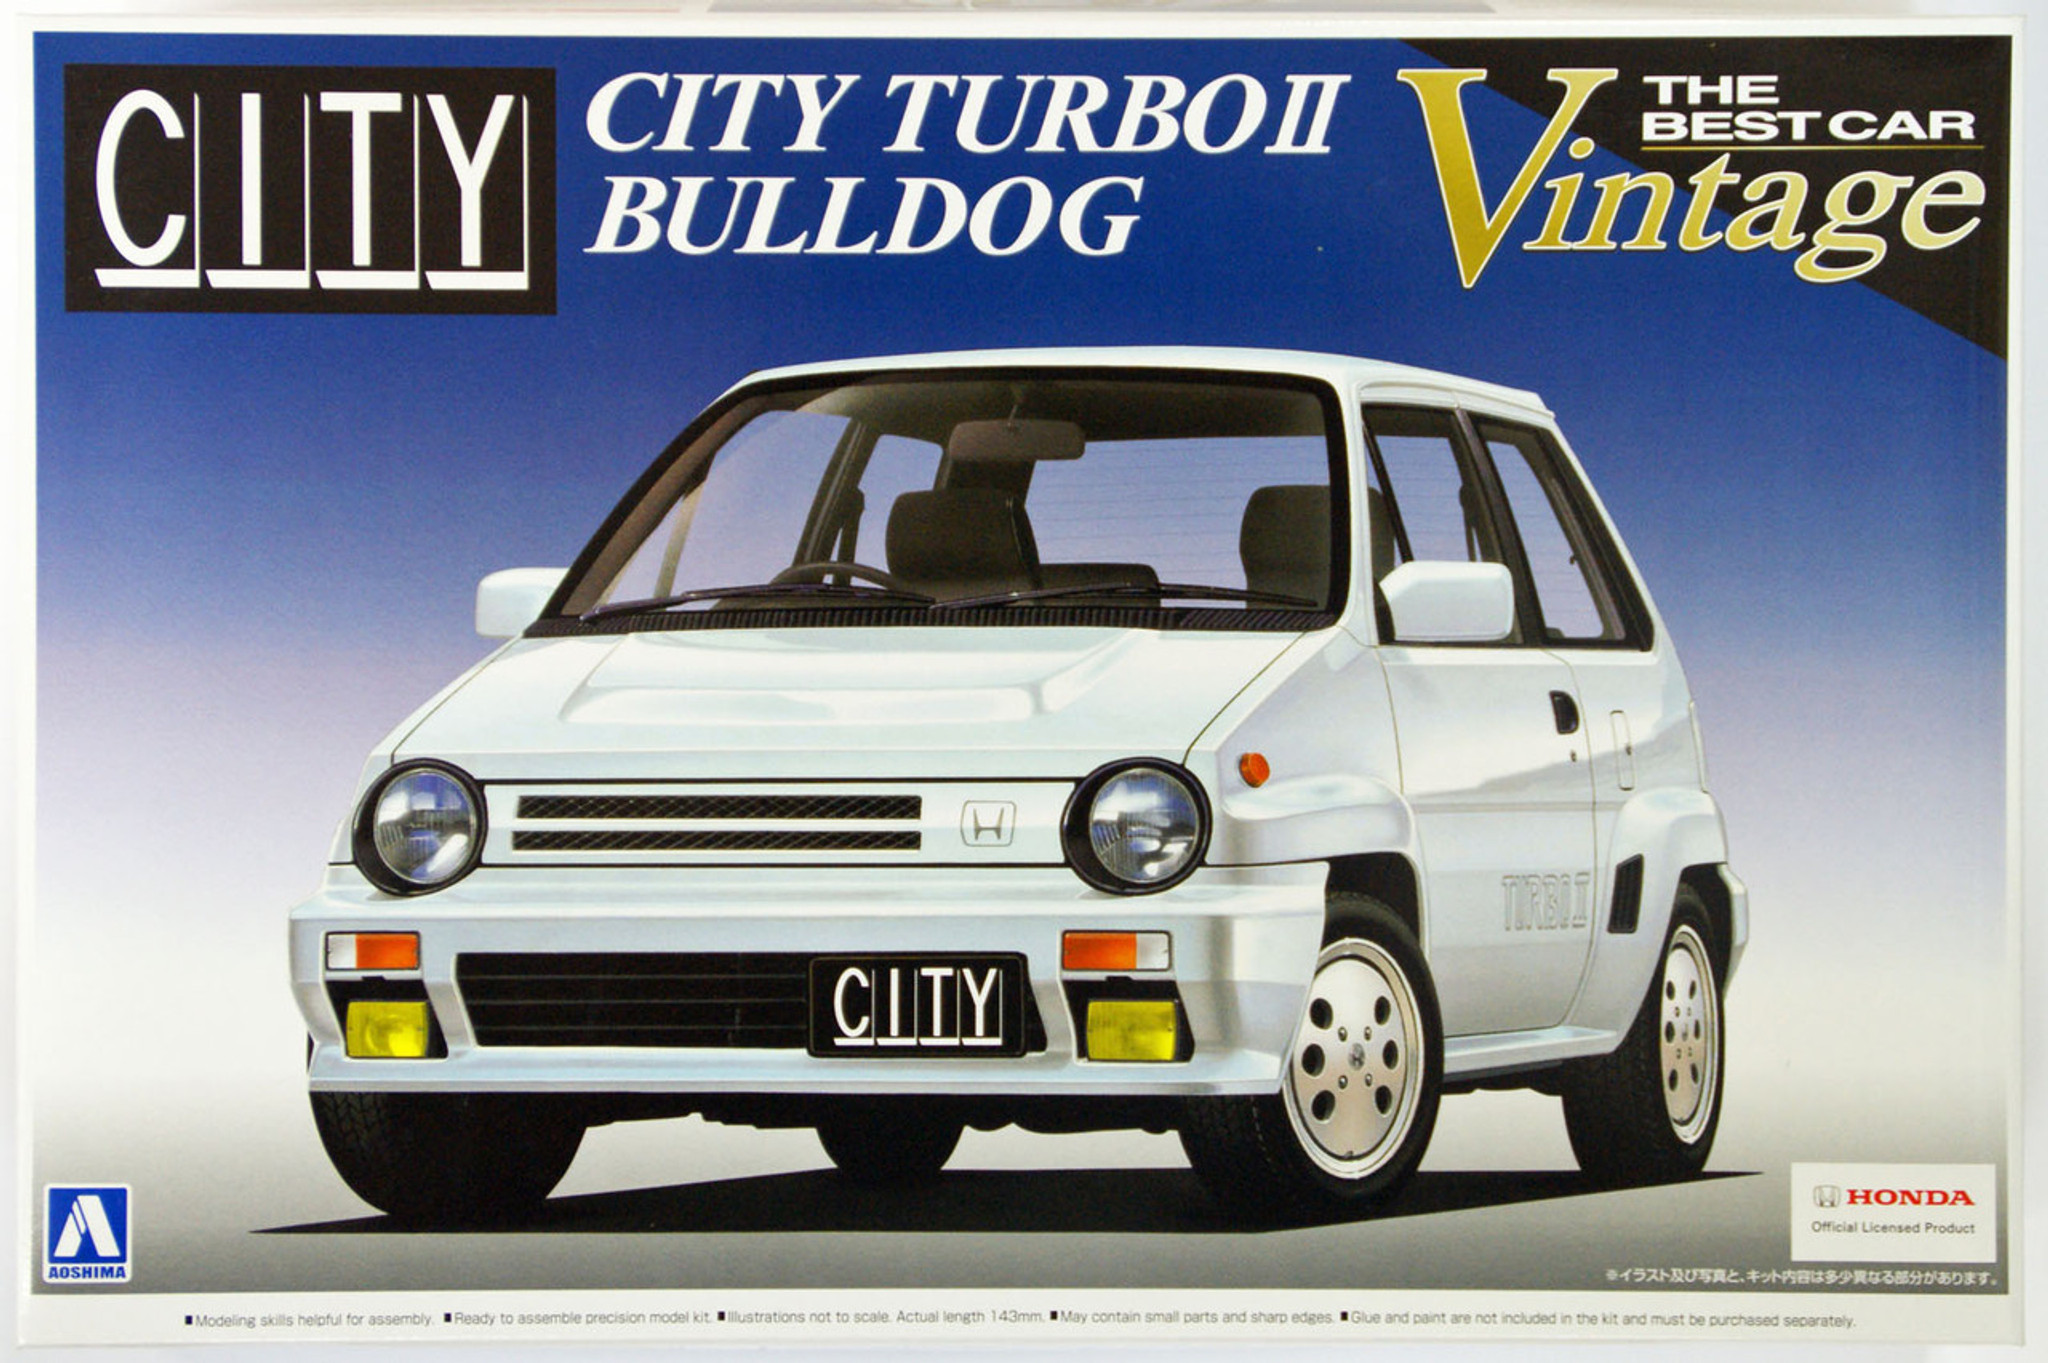 Aoshima 48368 Honda City Turbo II Bulldog 1 24 Scale Kit